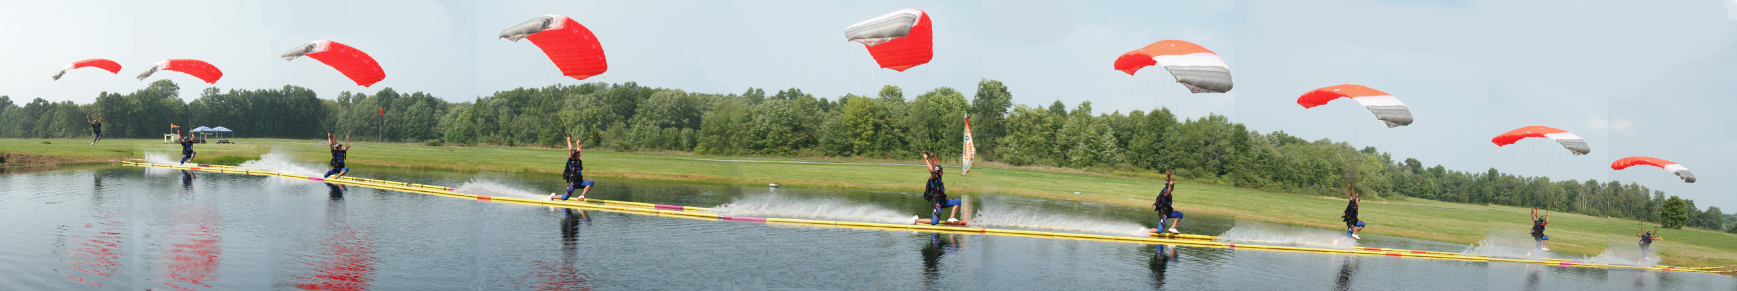 performance skydive